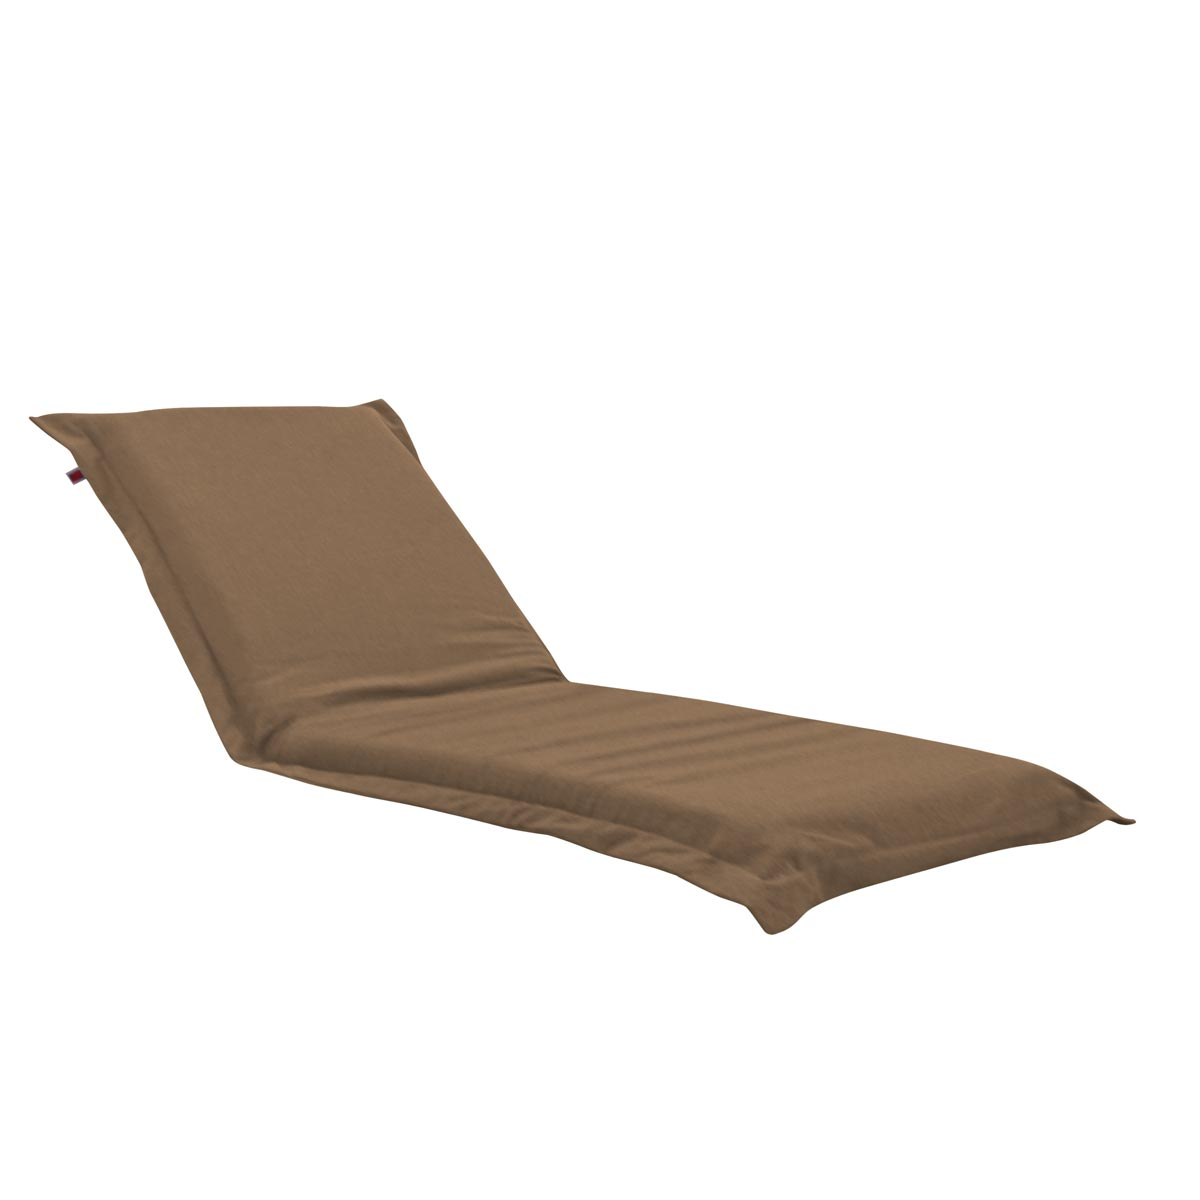 Pufe ClicClac Uno Lounge Tecido Ecolona Kraft 02 02